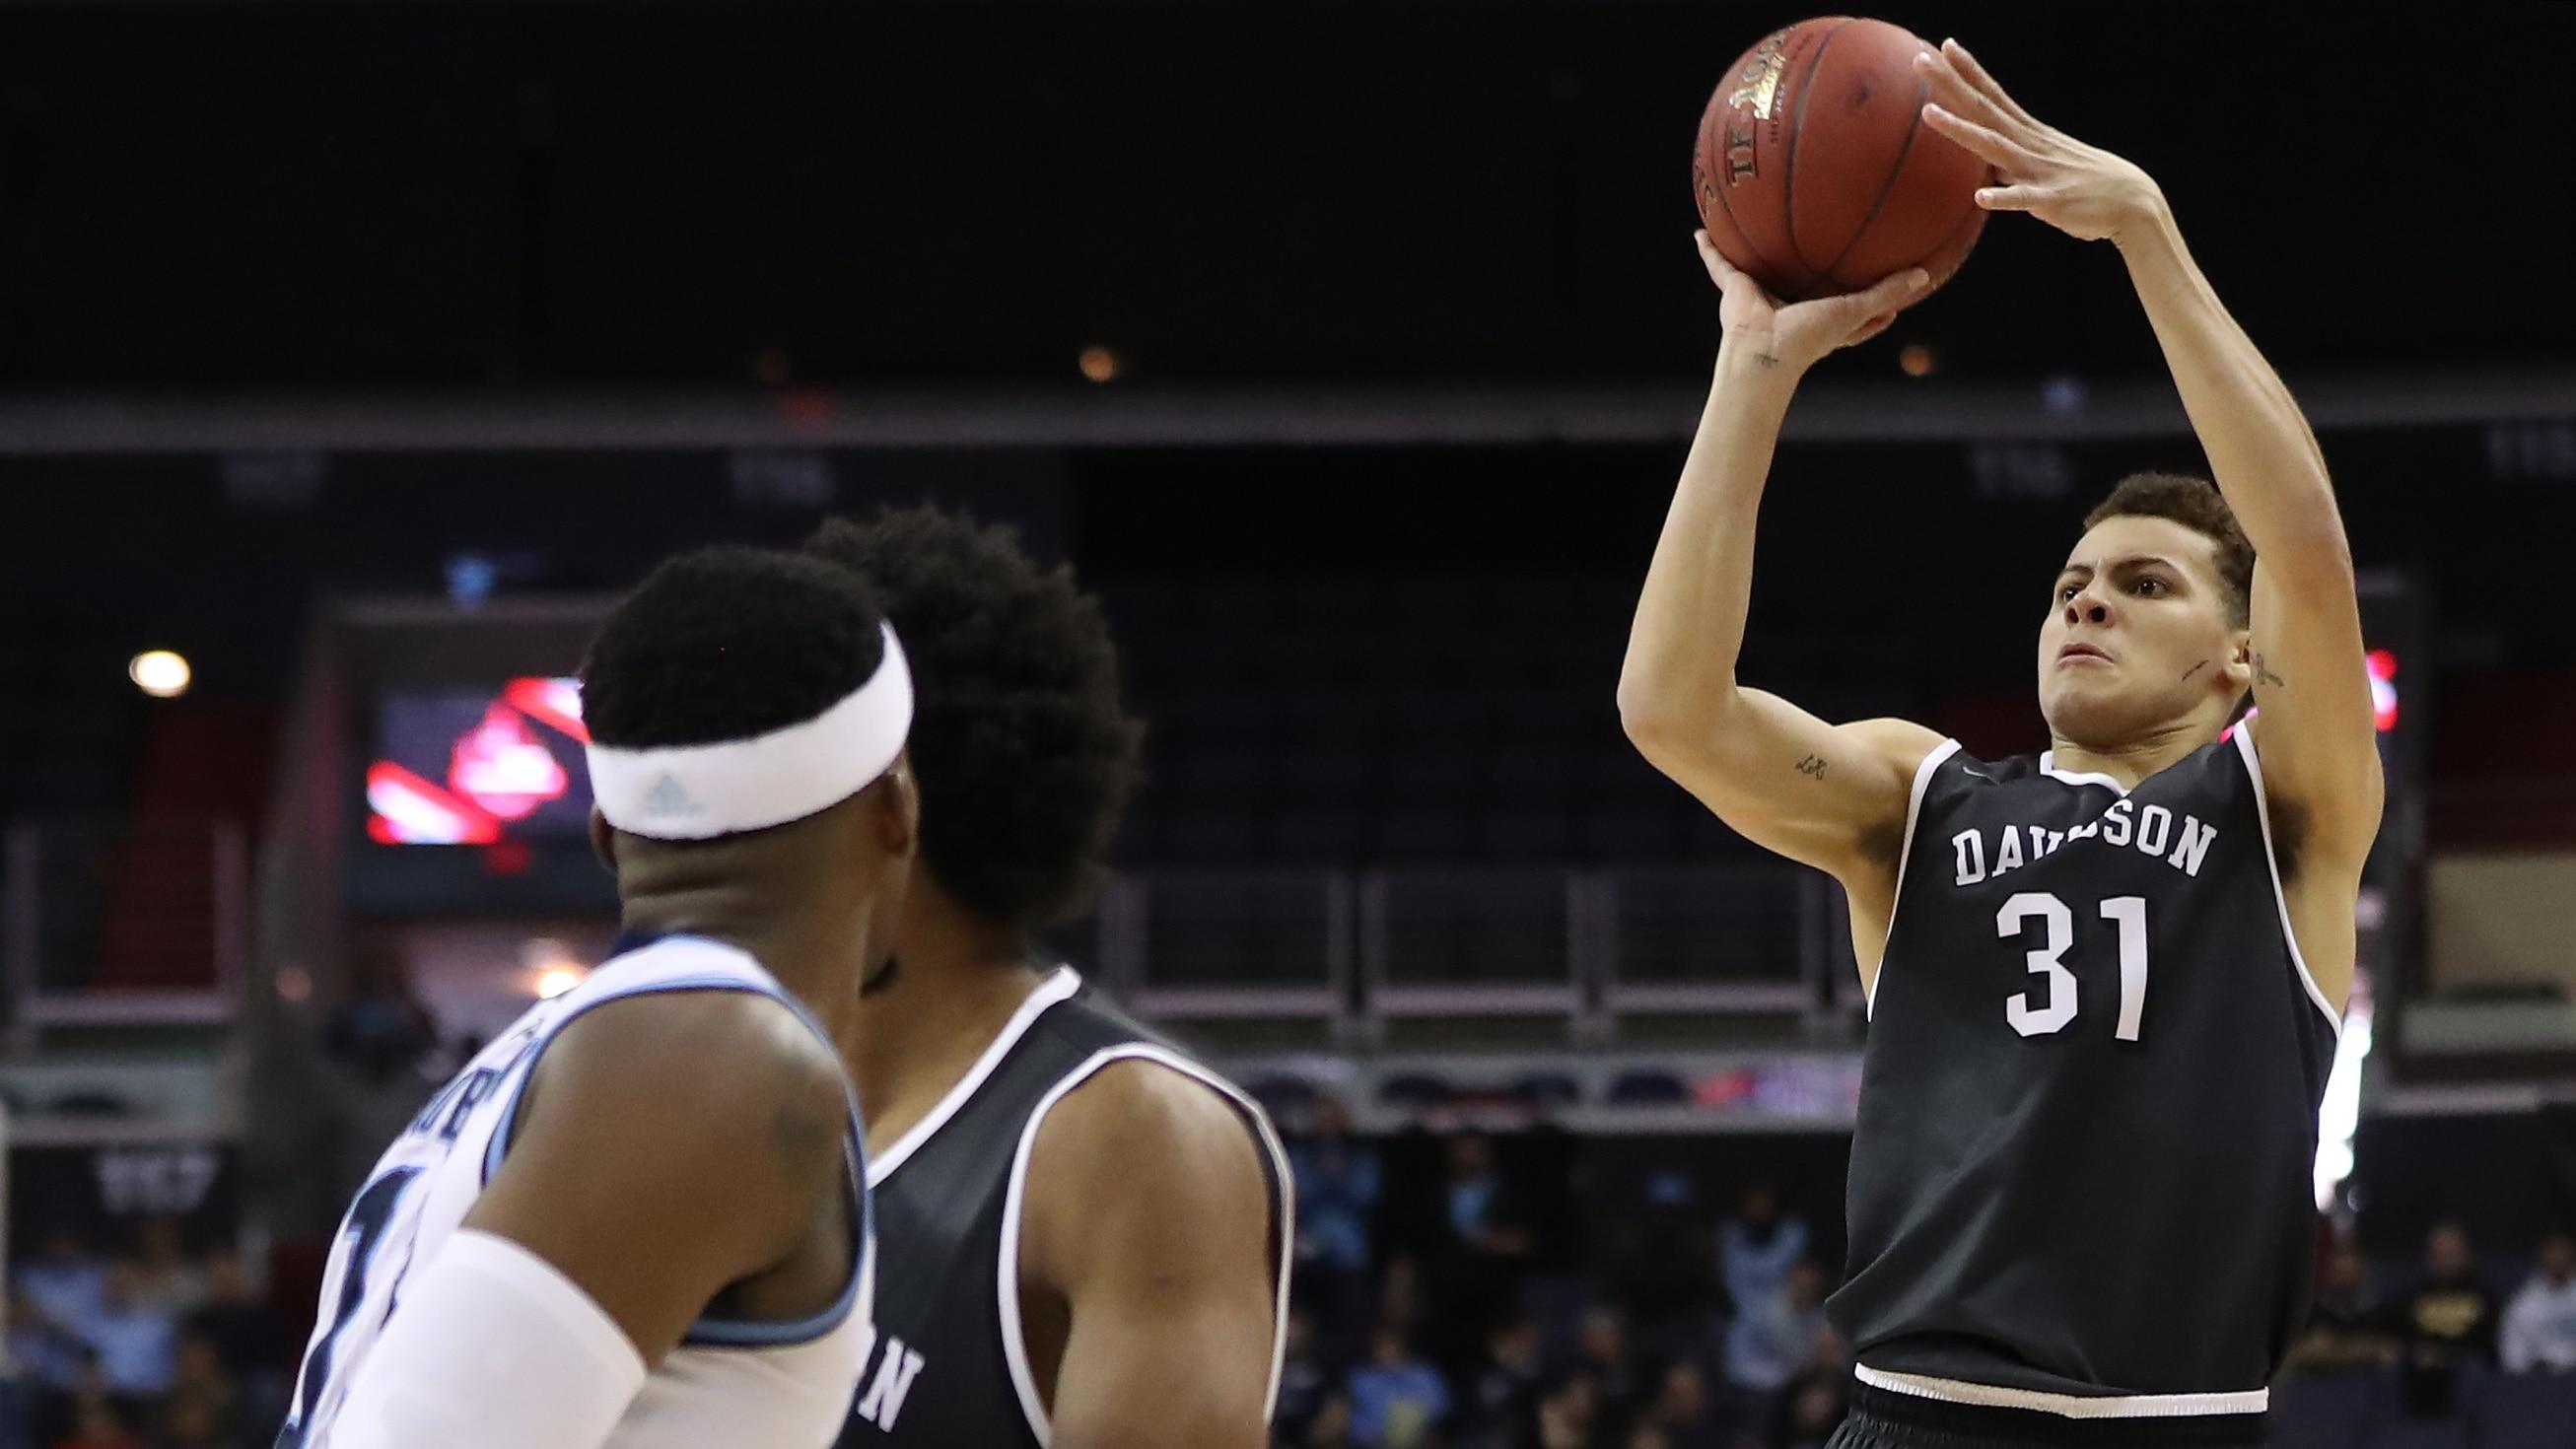 Davidson's Kellan Grady shoots a jumper